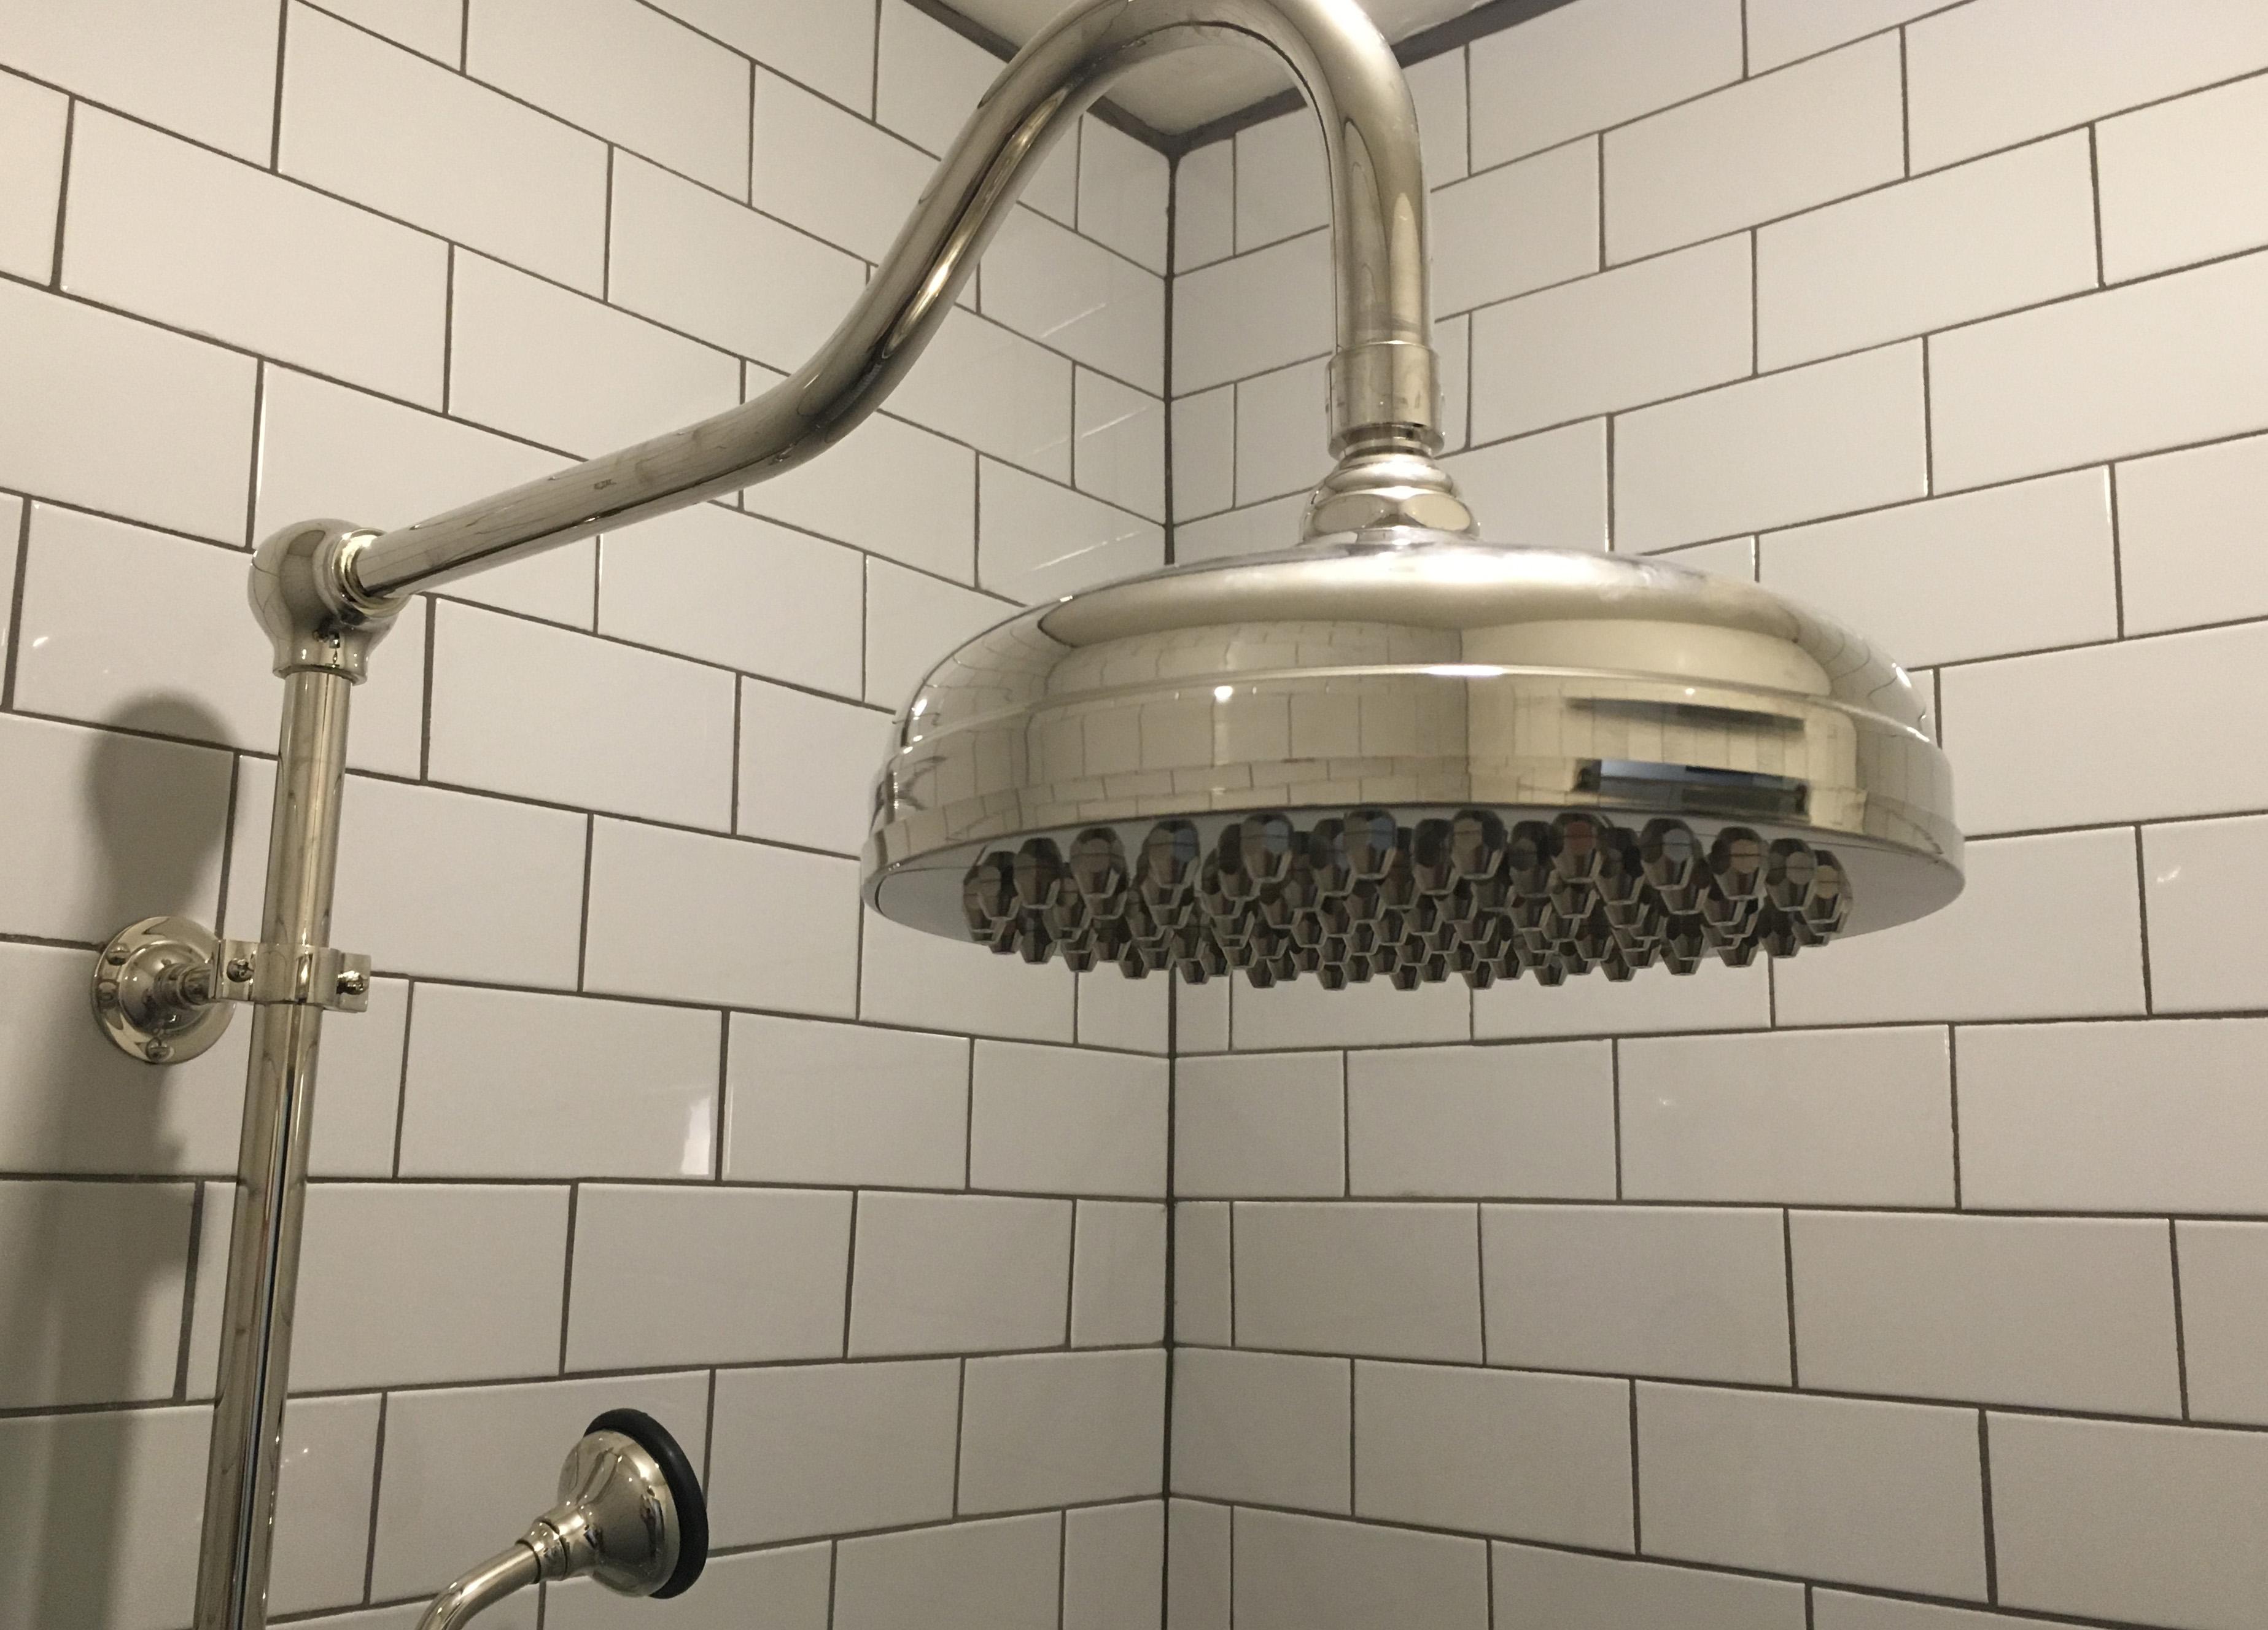 Inspired Remodeling & Tile